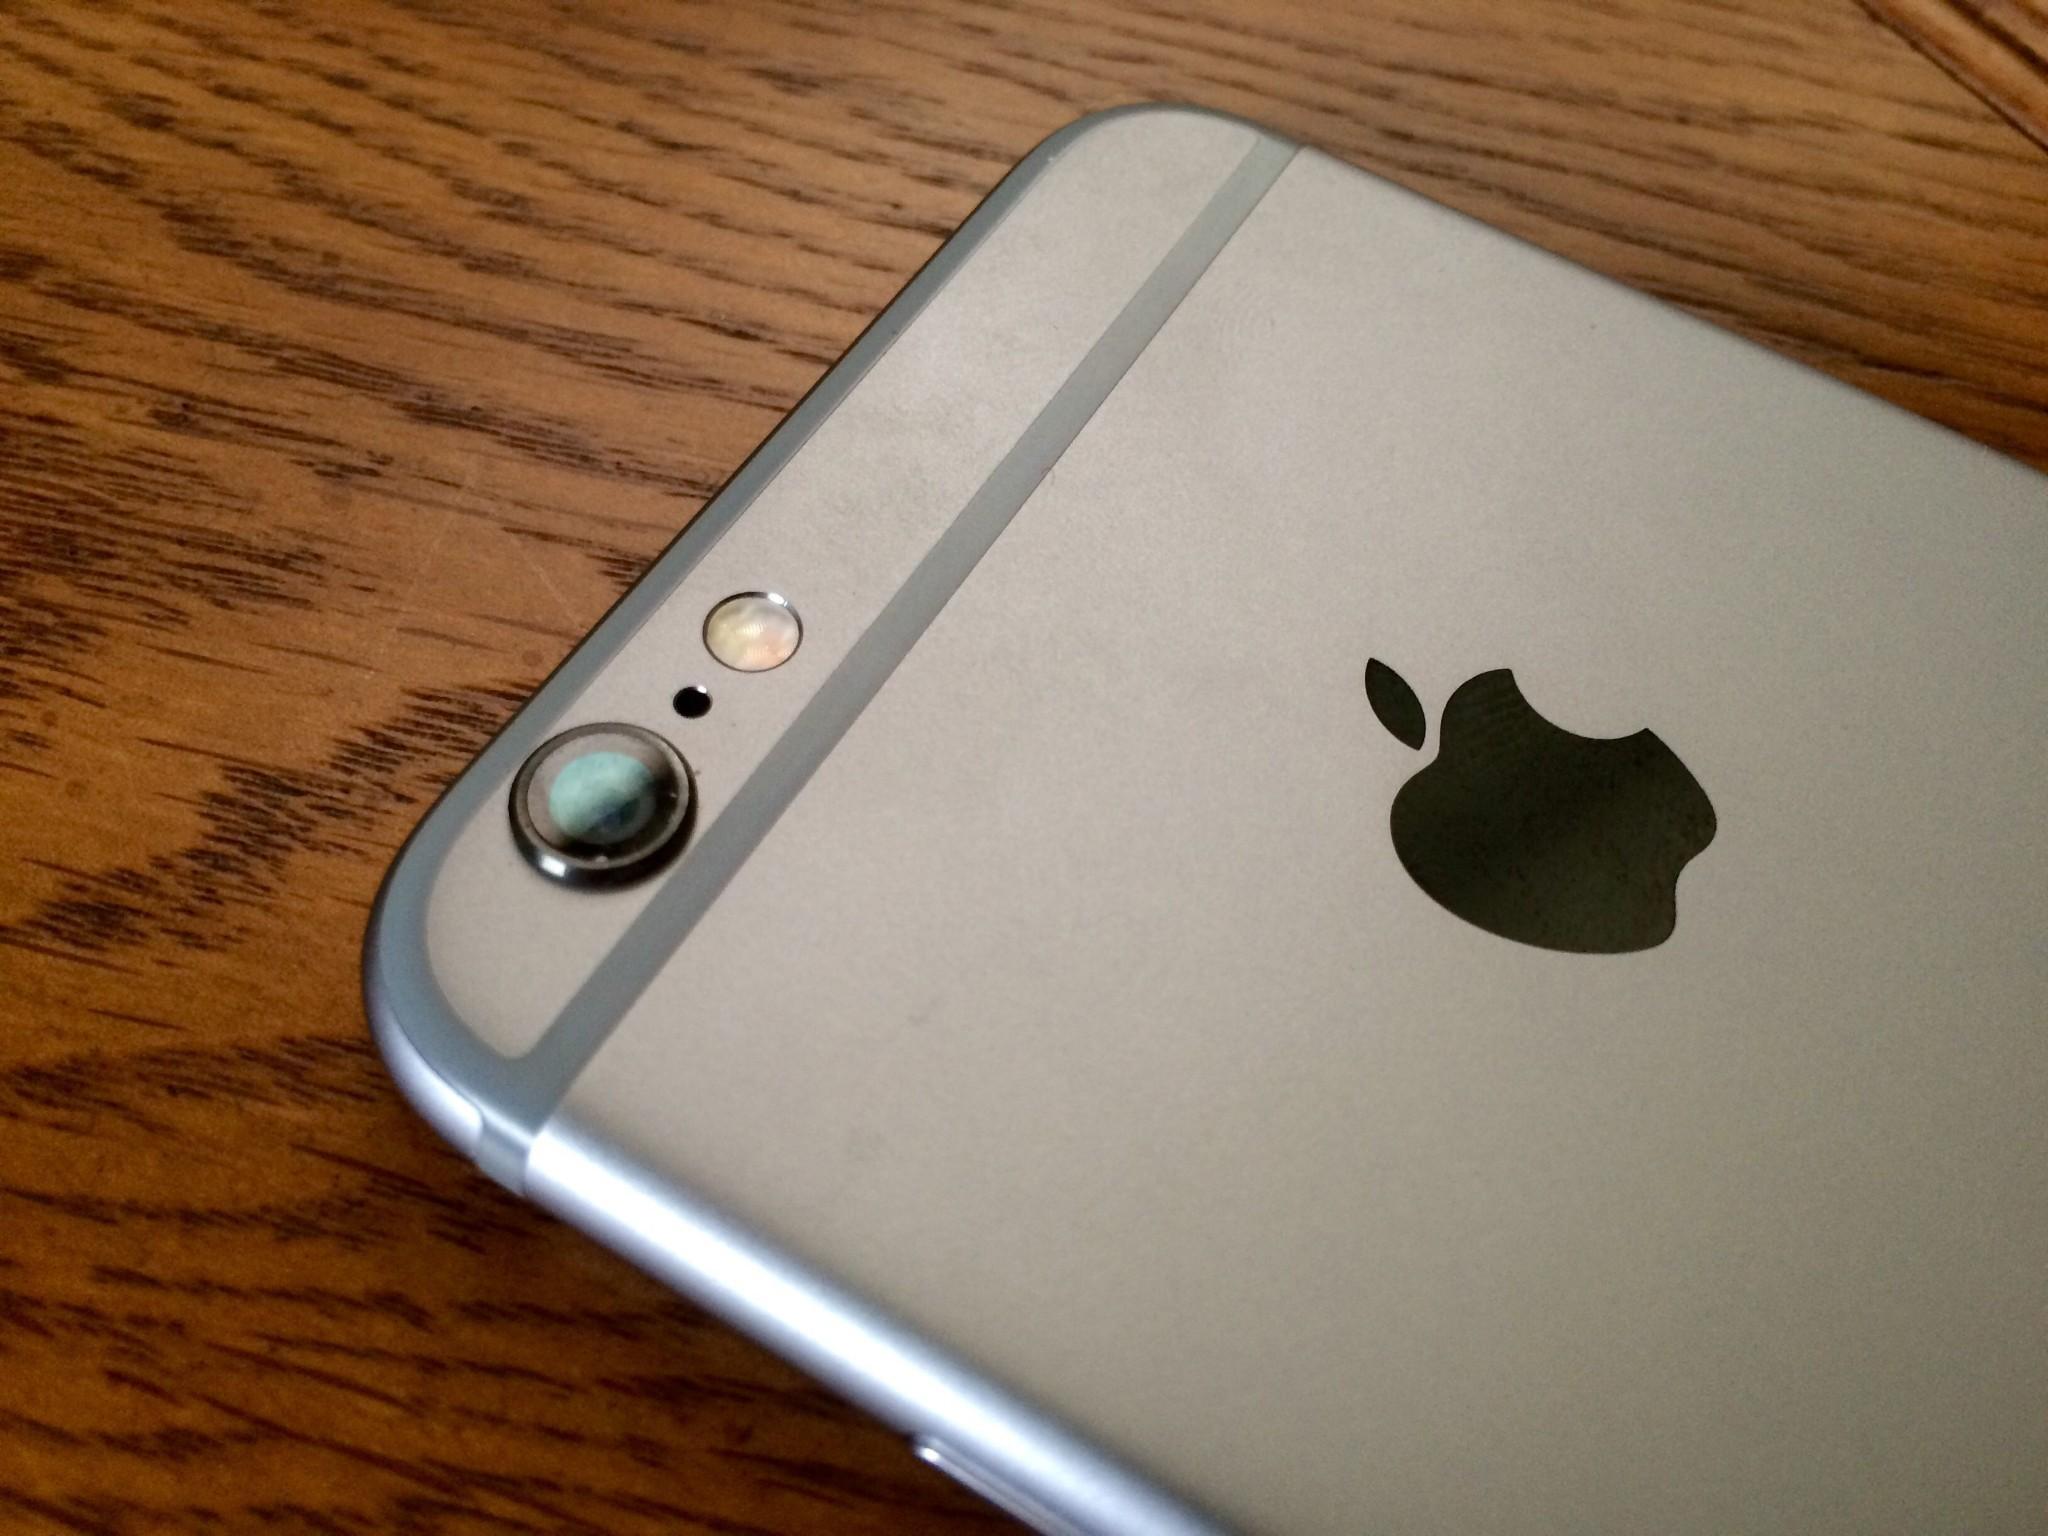 Apple reduces the amount of storage iOS updates require